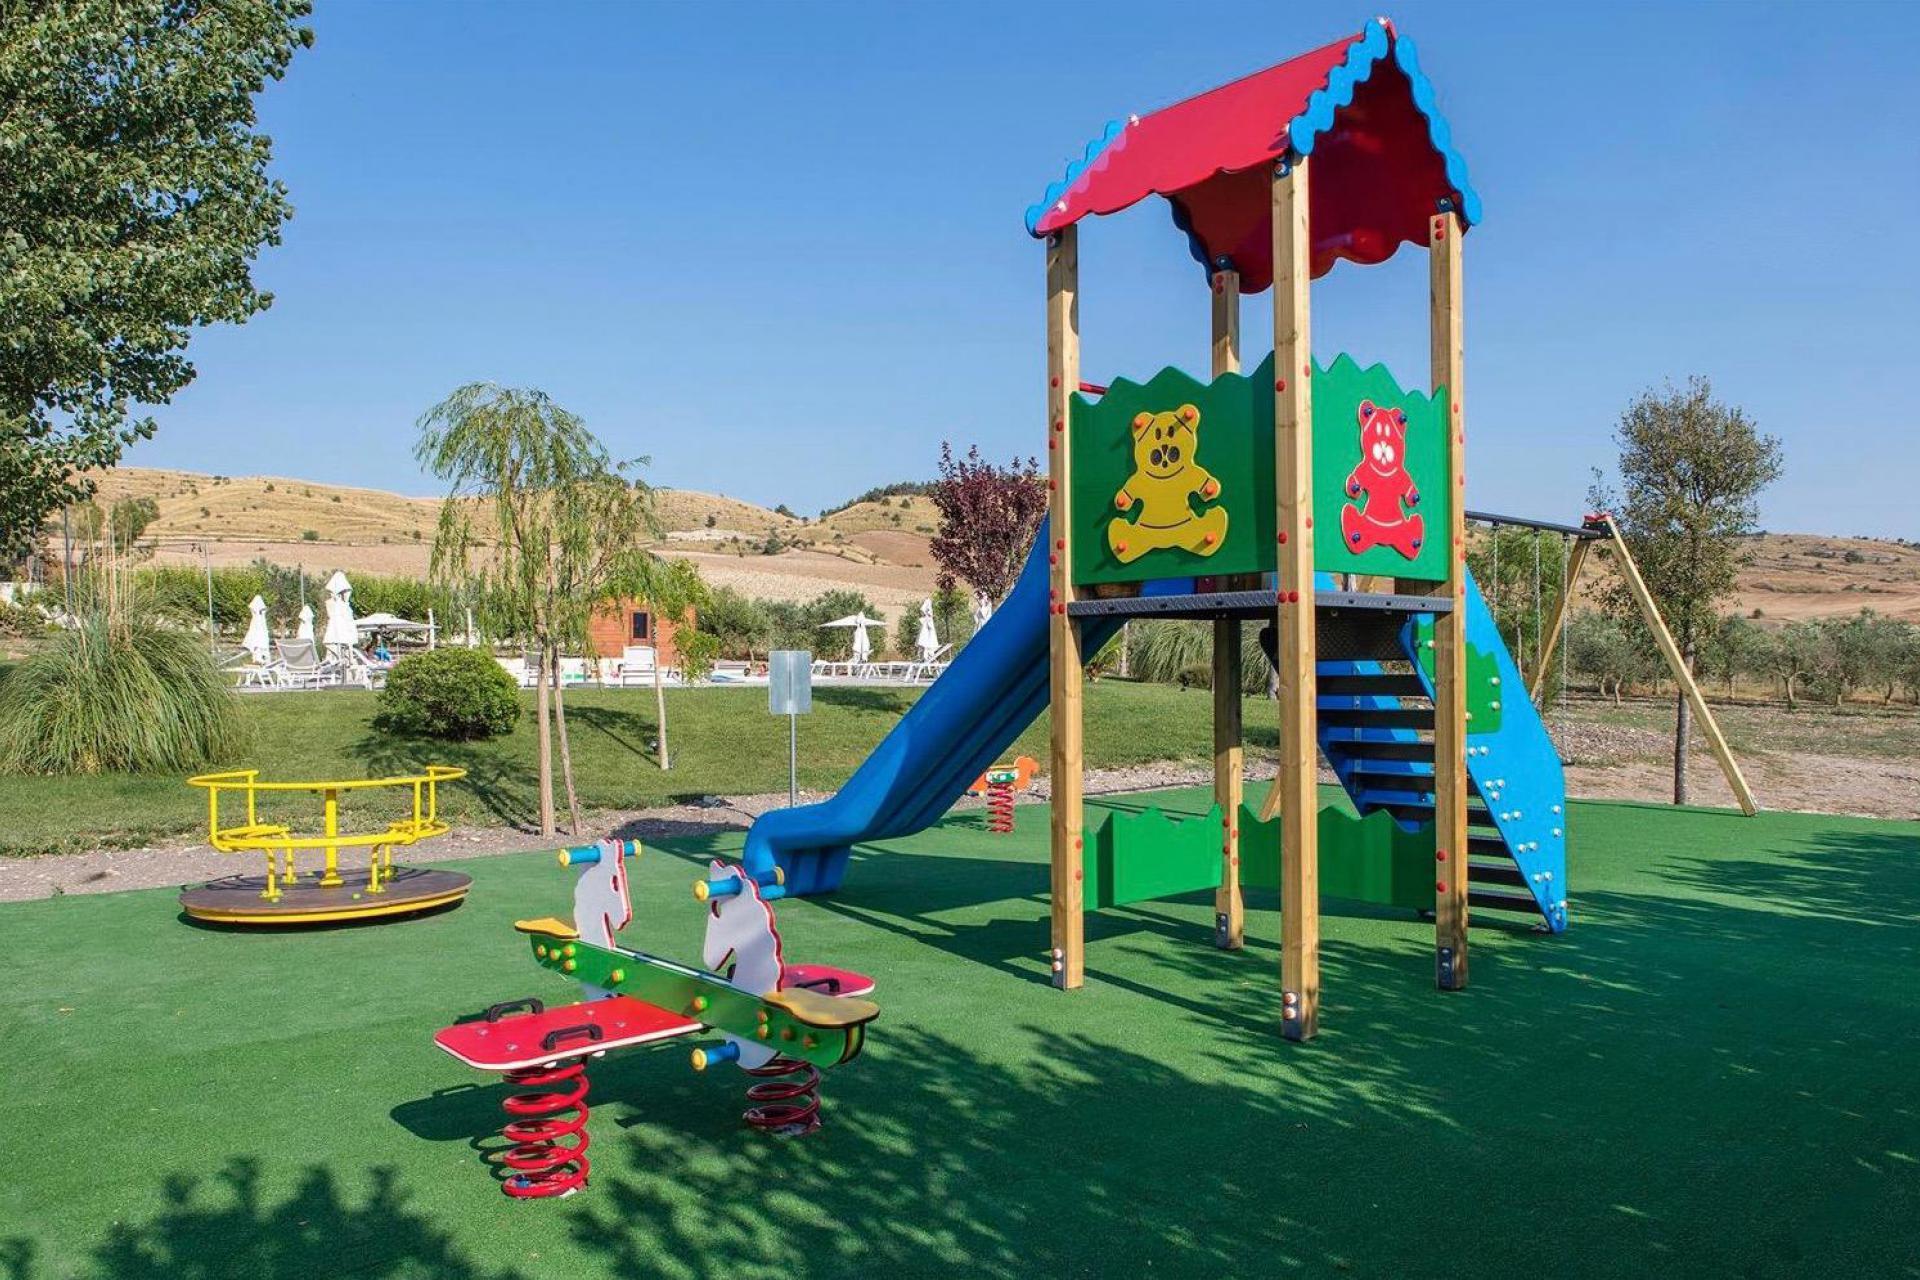 Agriturismo Sicilie Familievriendelijke agriturismo op Sicilië met groot zwembad